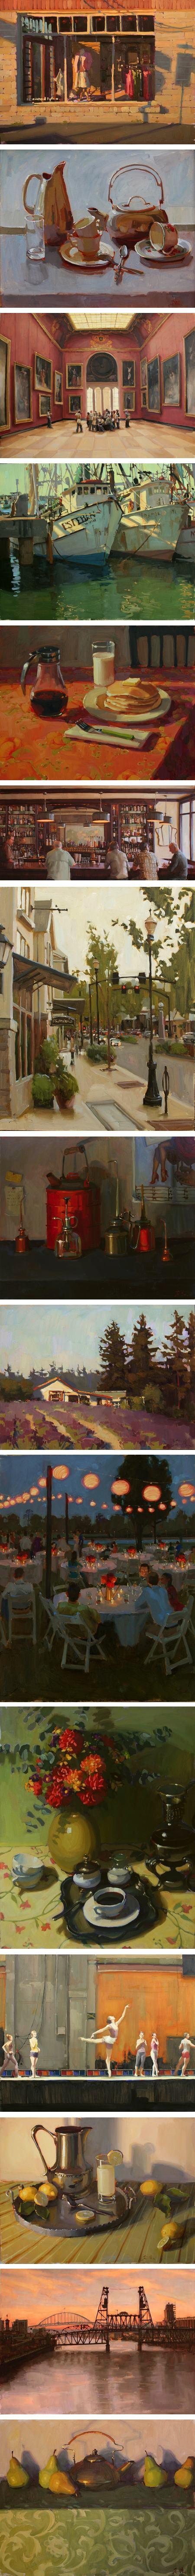 Jennifer Diehl, still life, landscape, cituscape, interiors, figurative painting